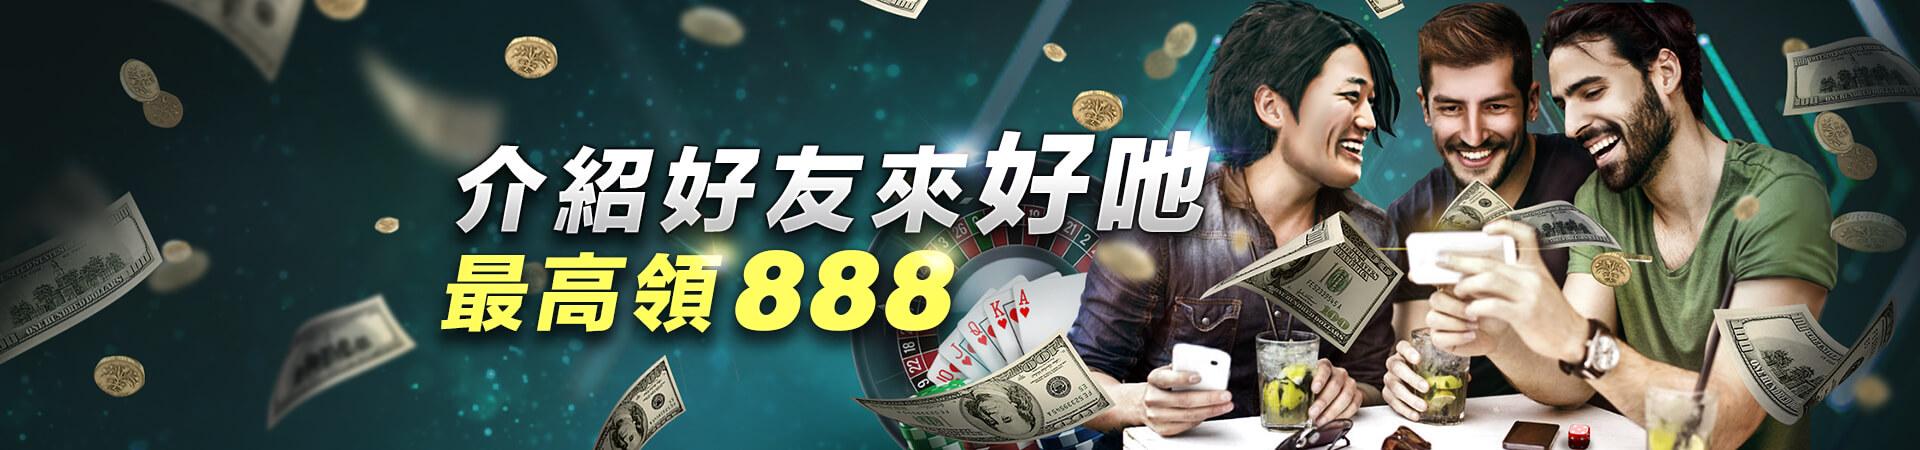 HOYA娛樂城 - 介紹好友來HOYA!最高領888發財金!